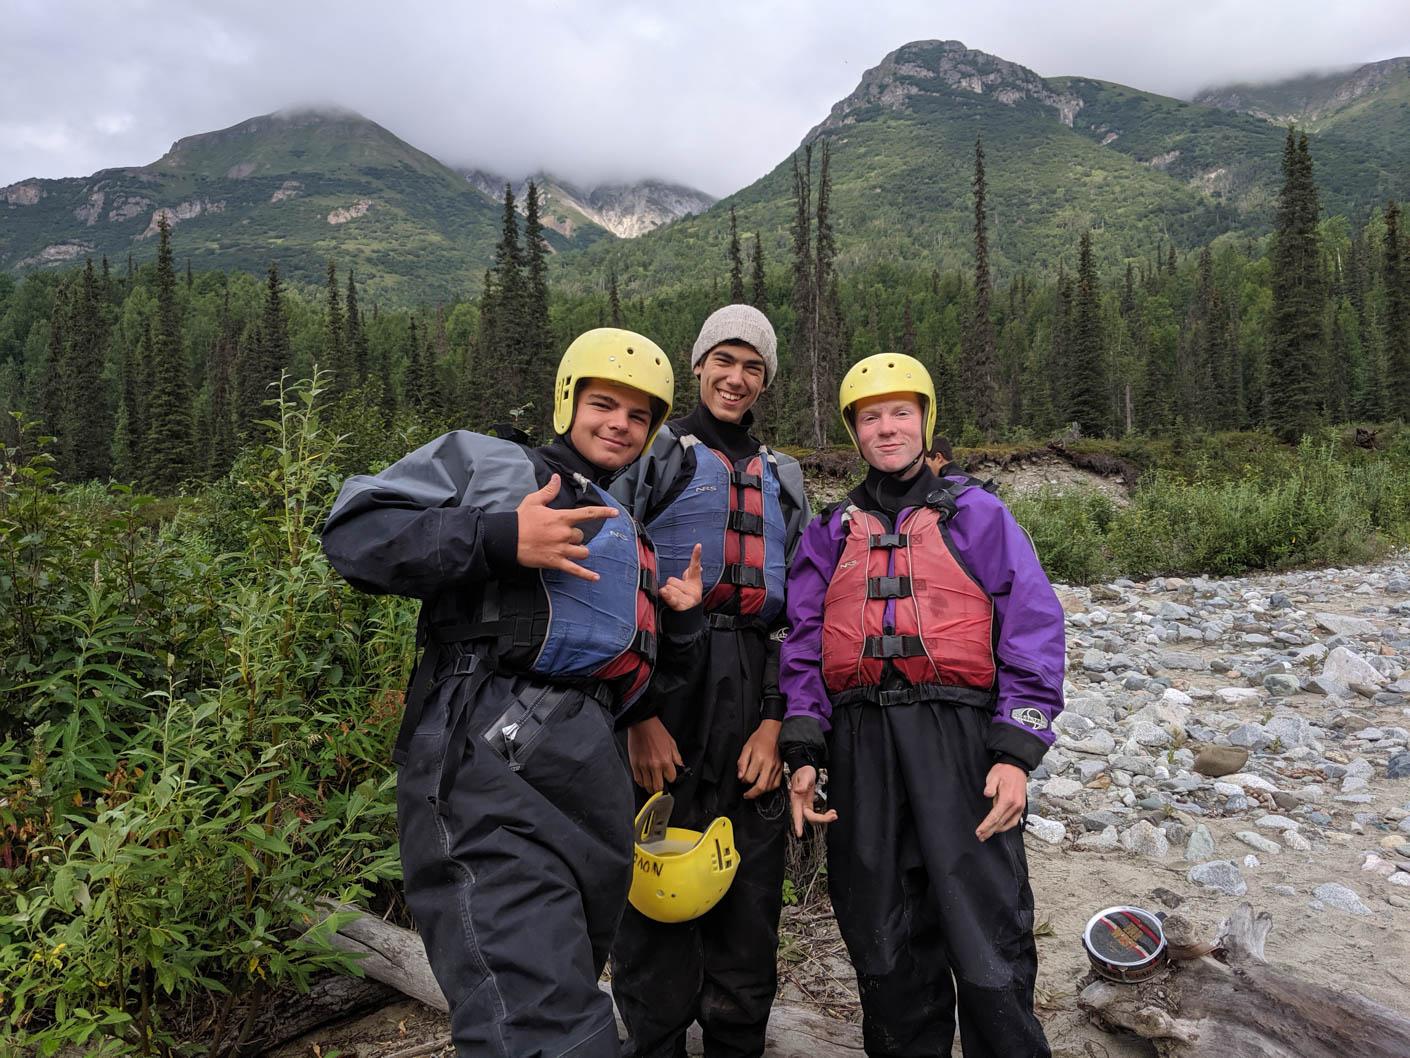 Alaska Southeast whitewater rafting